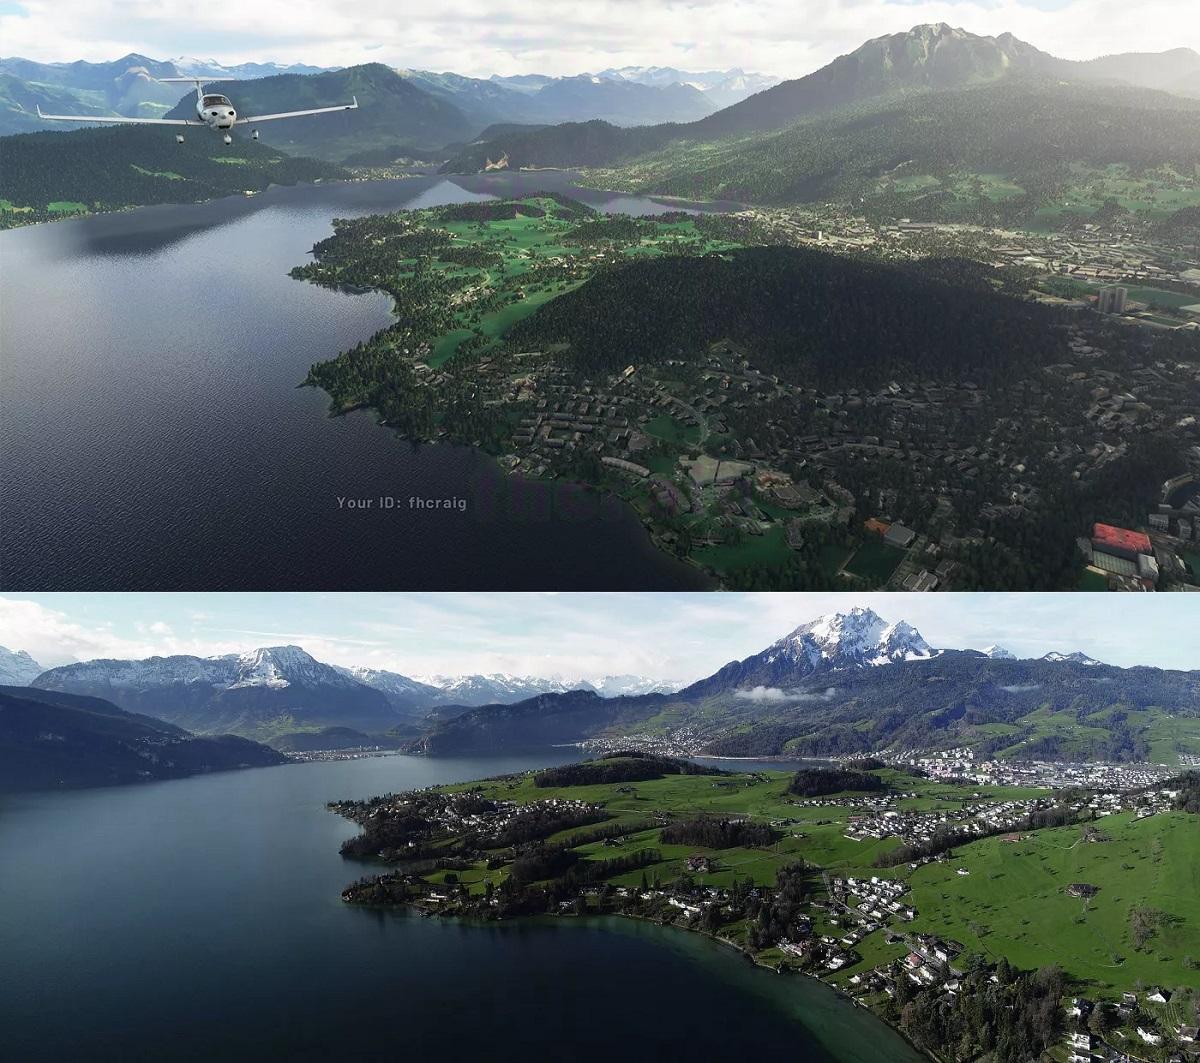 Flight Simulator 2020 screenshots vs. real world images ...